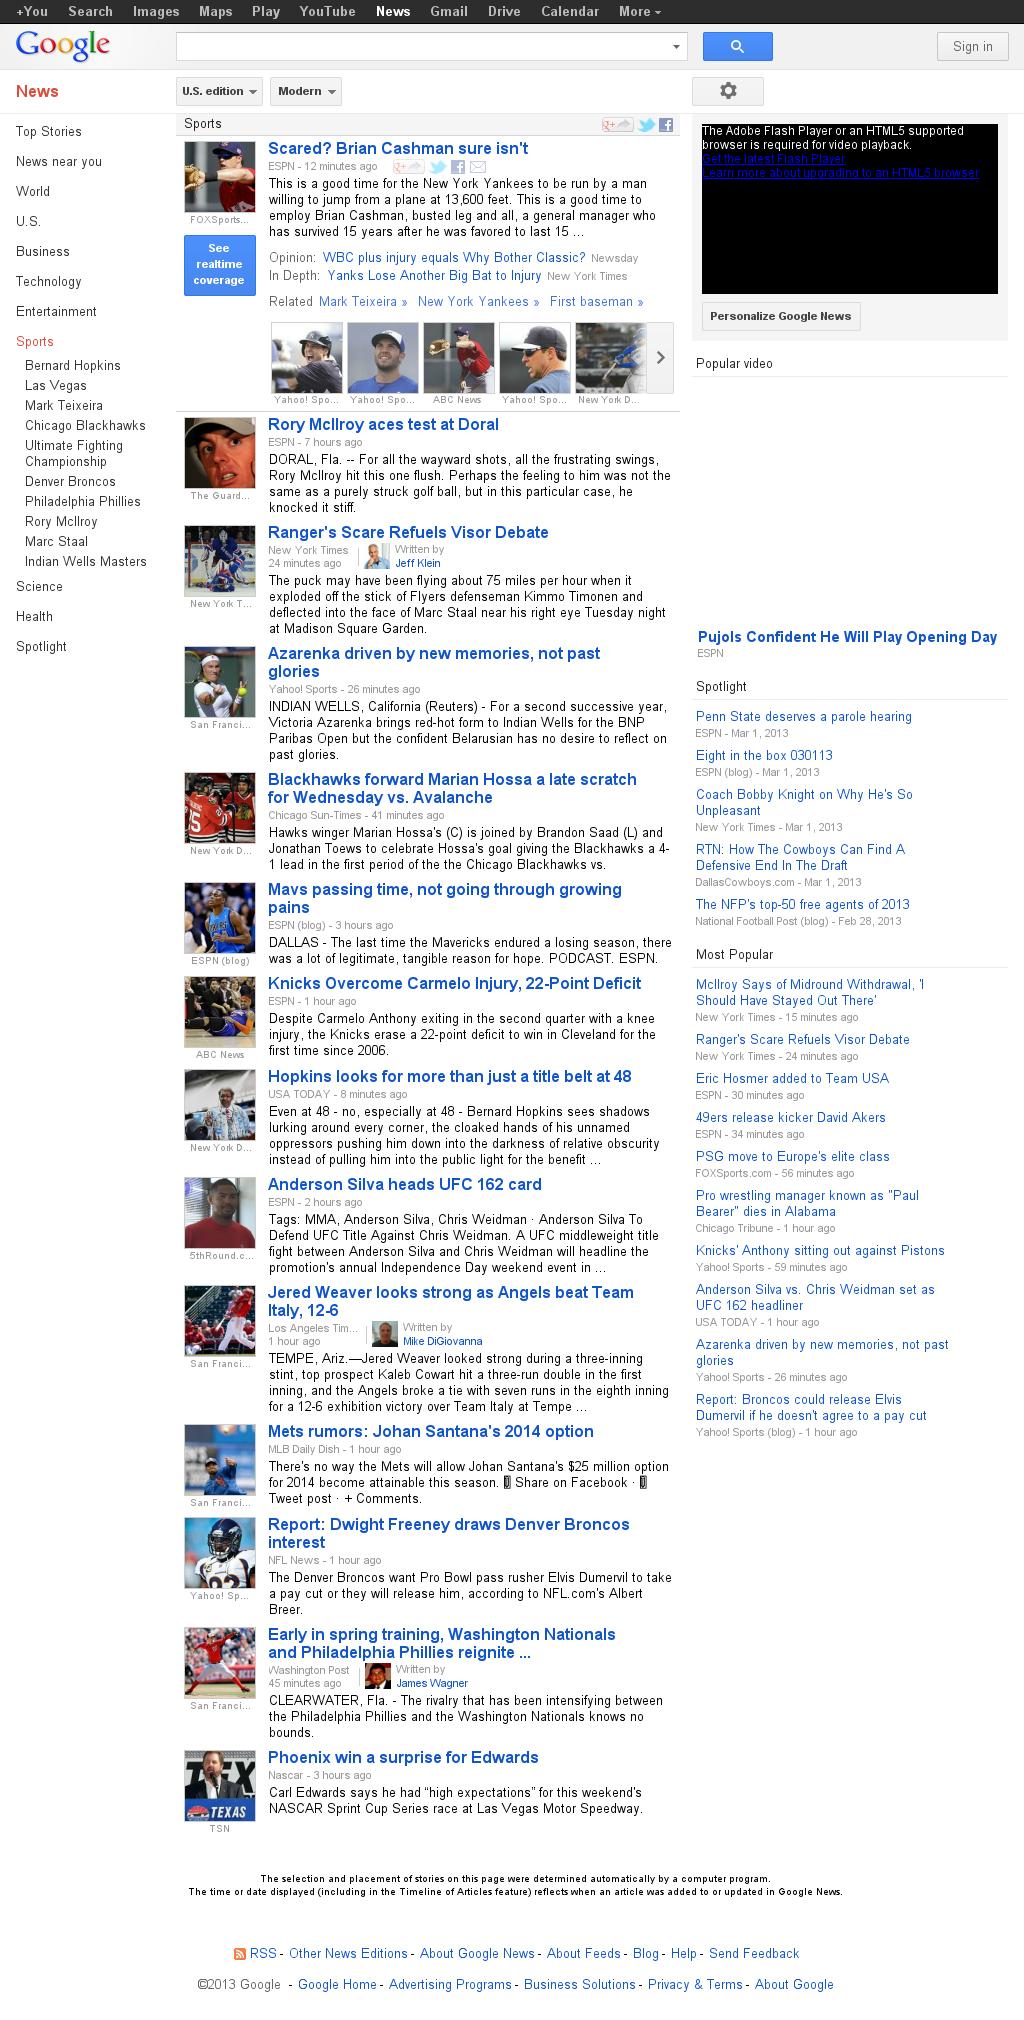 Google News: Sports at Thursday March 7, 2013, 2:07 a.m. UTC